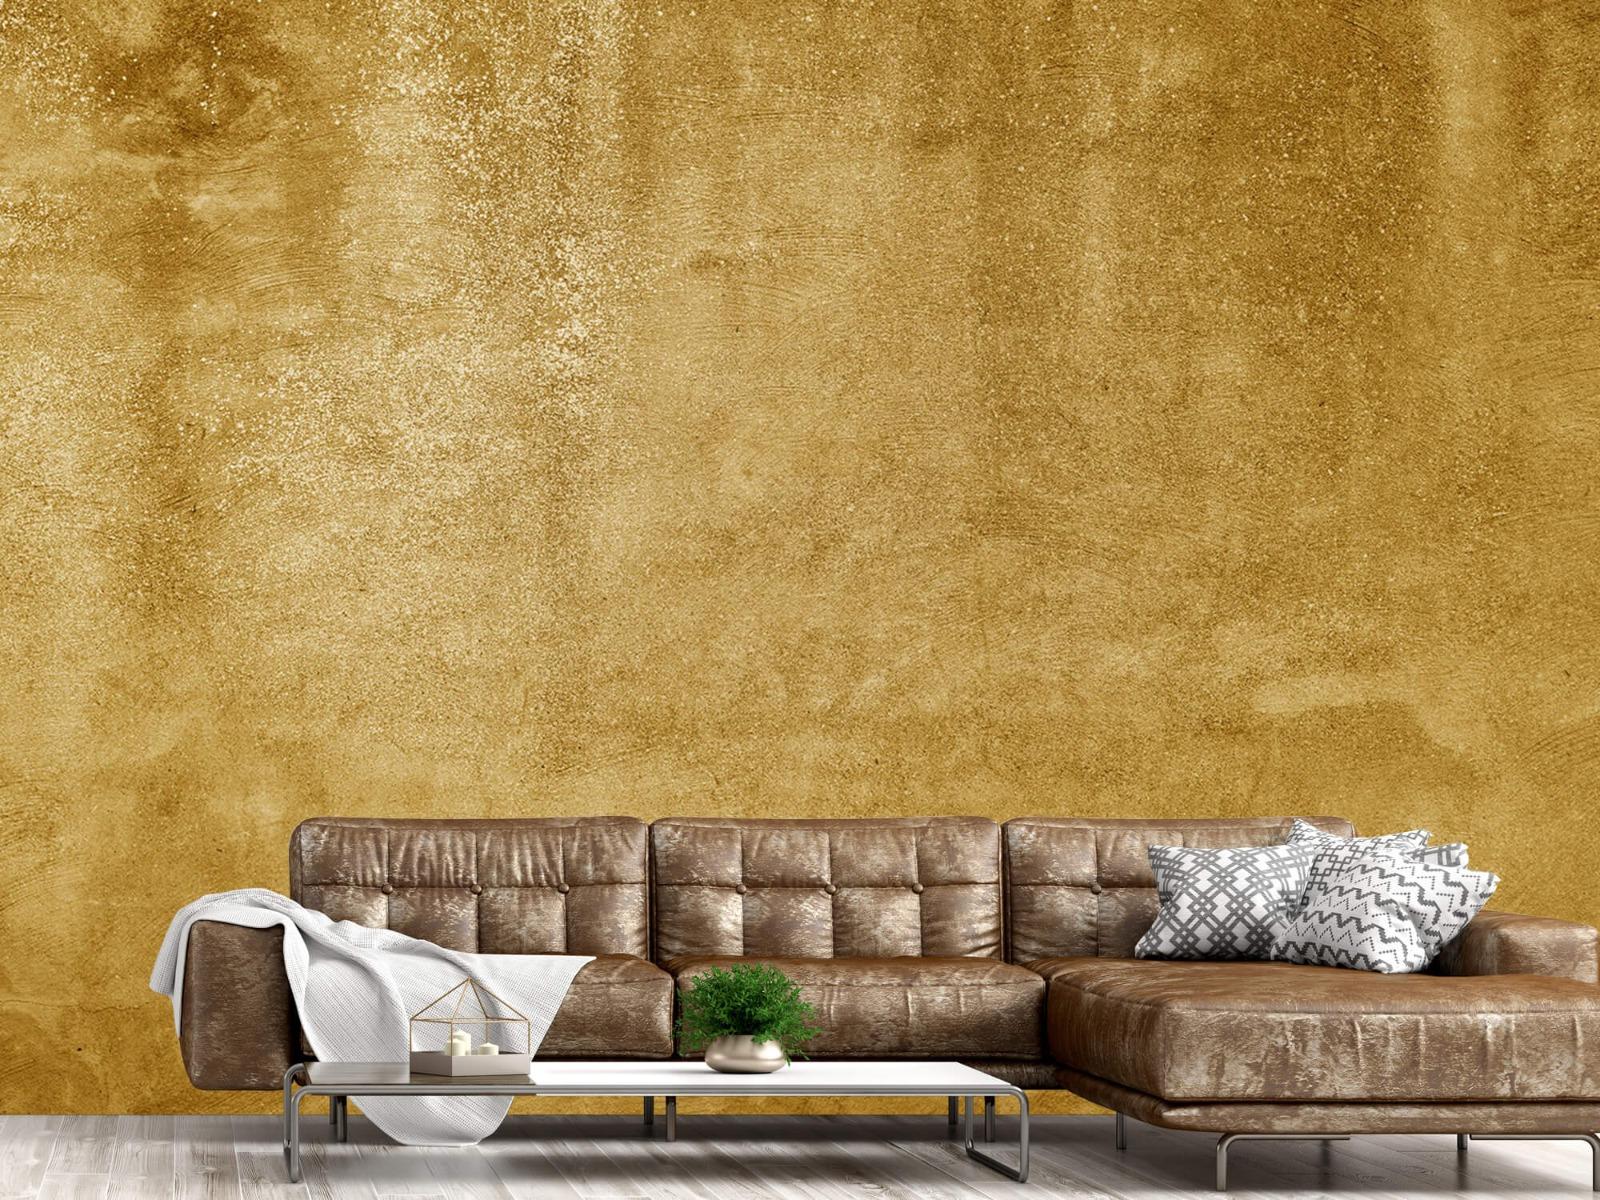 Betonlook behang - Oker geel beton - Woonkamer 14